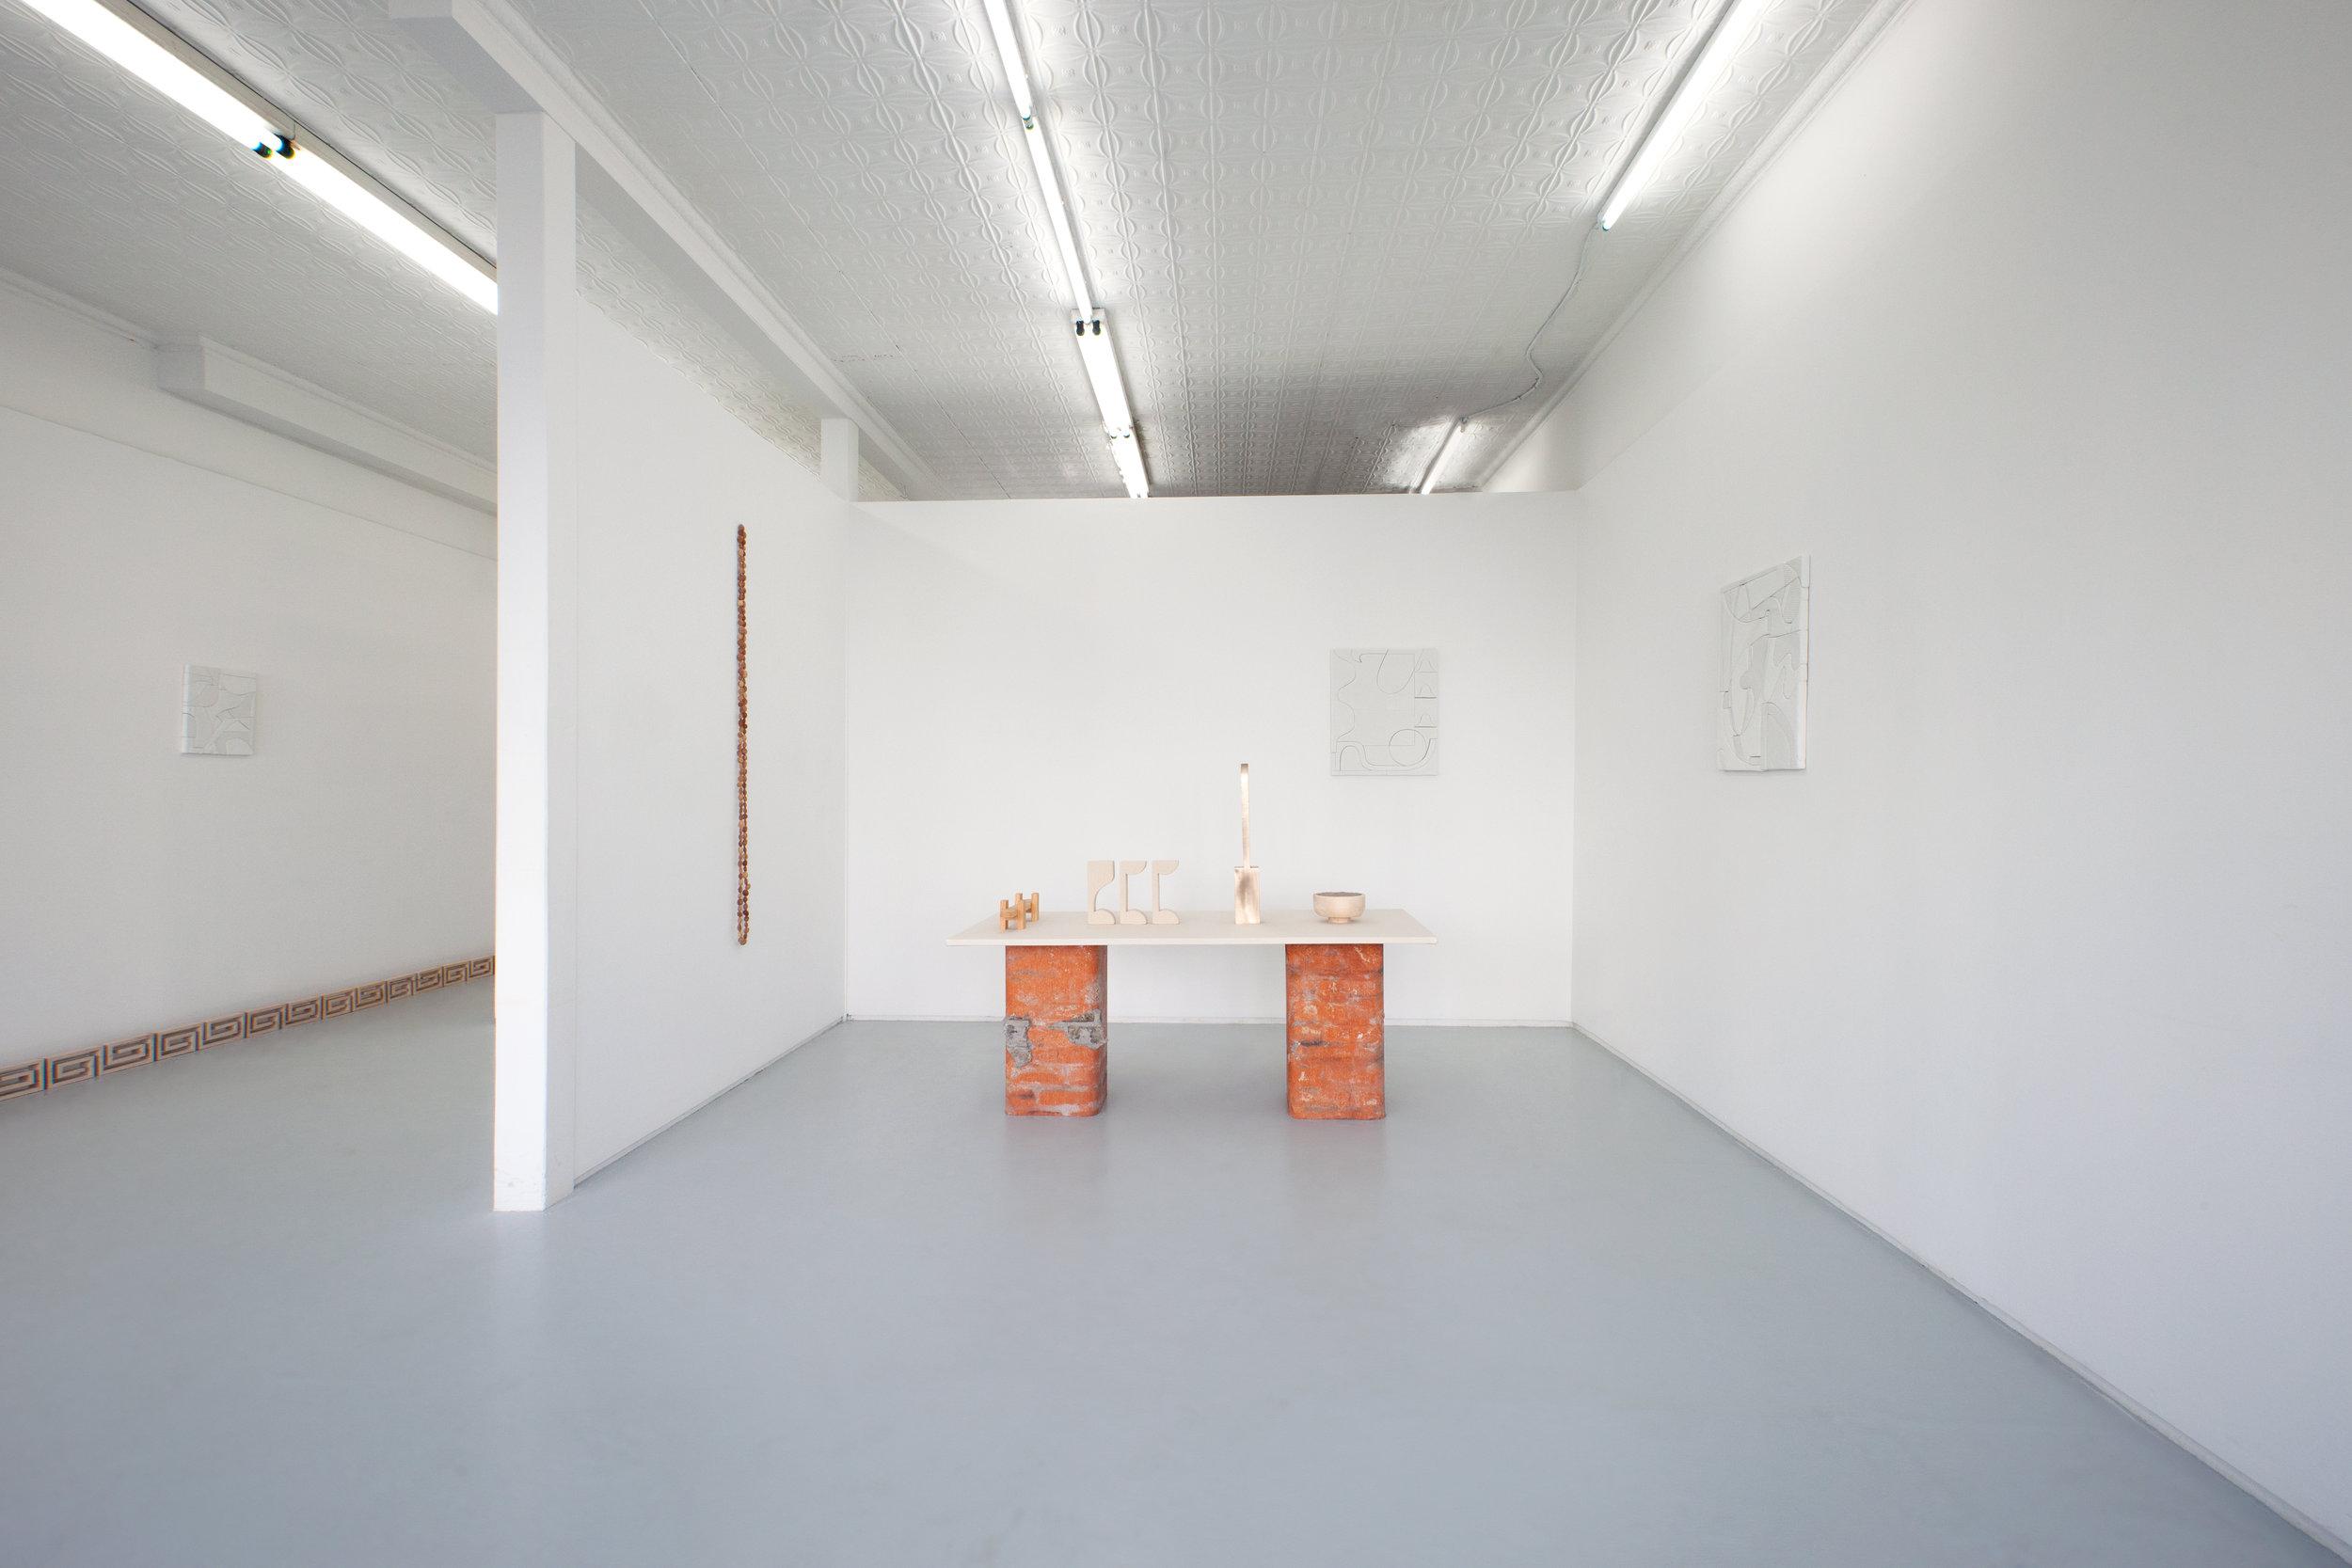 Elizabeth_Atterbury-Night_Comes_In-Installation_View_016.jpg